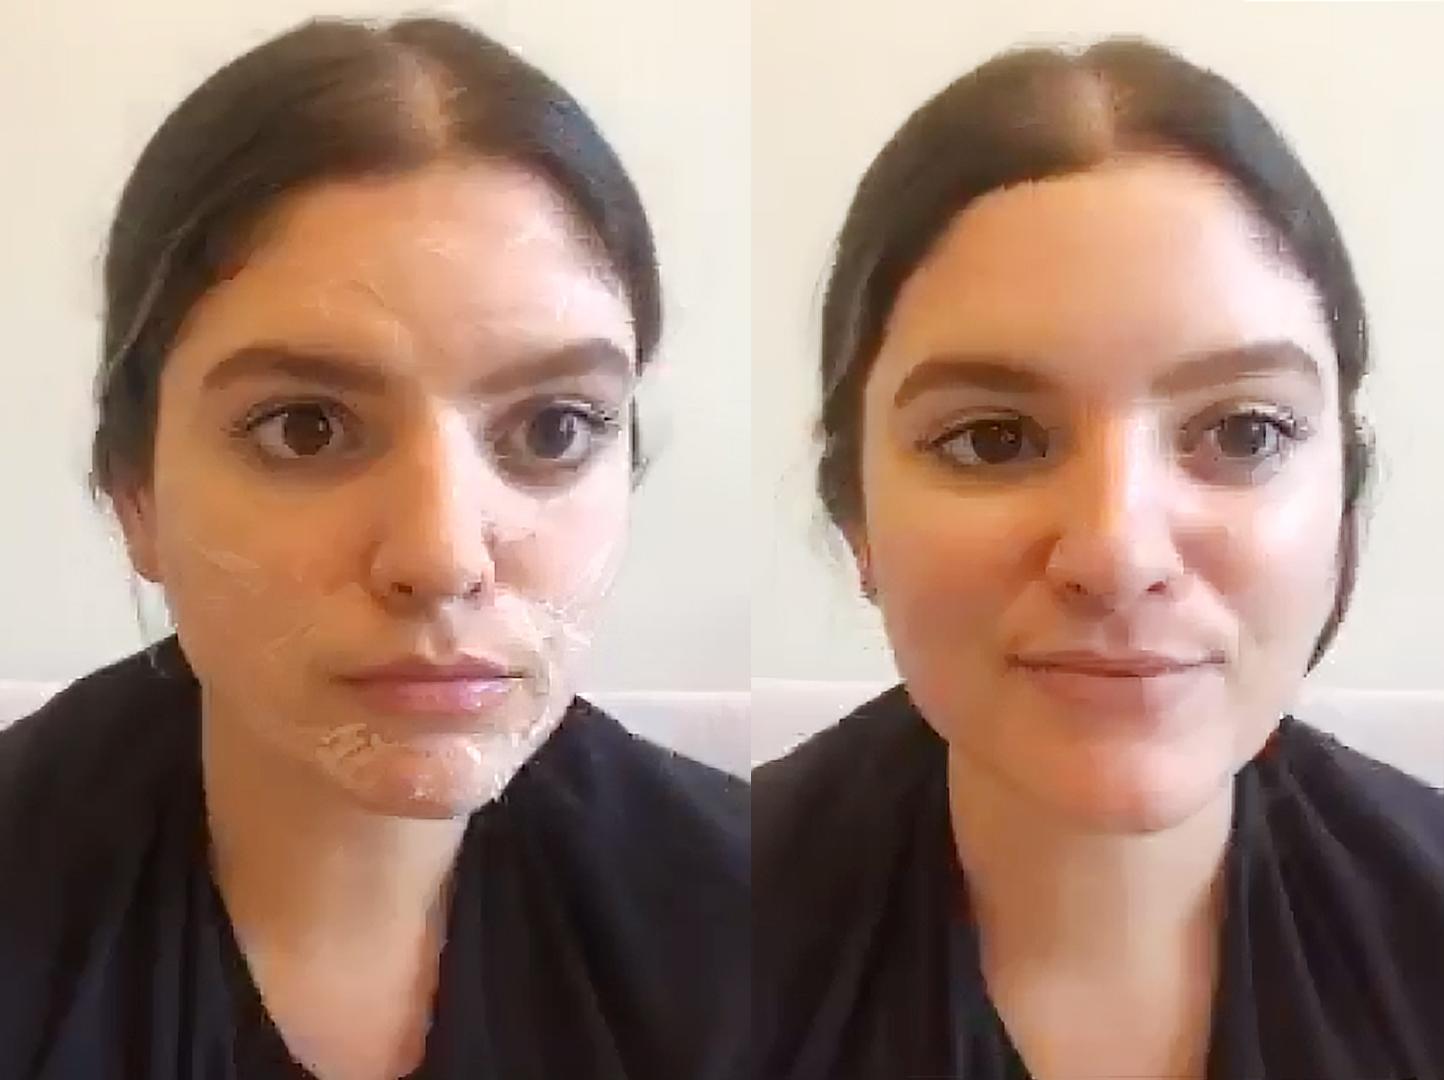 Firming facial muscles